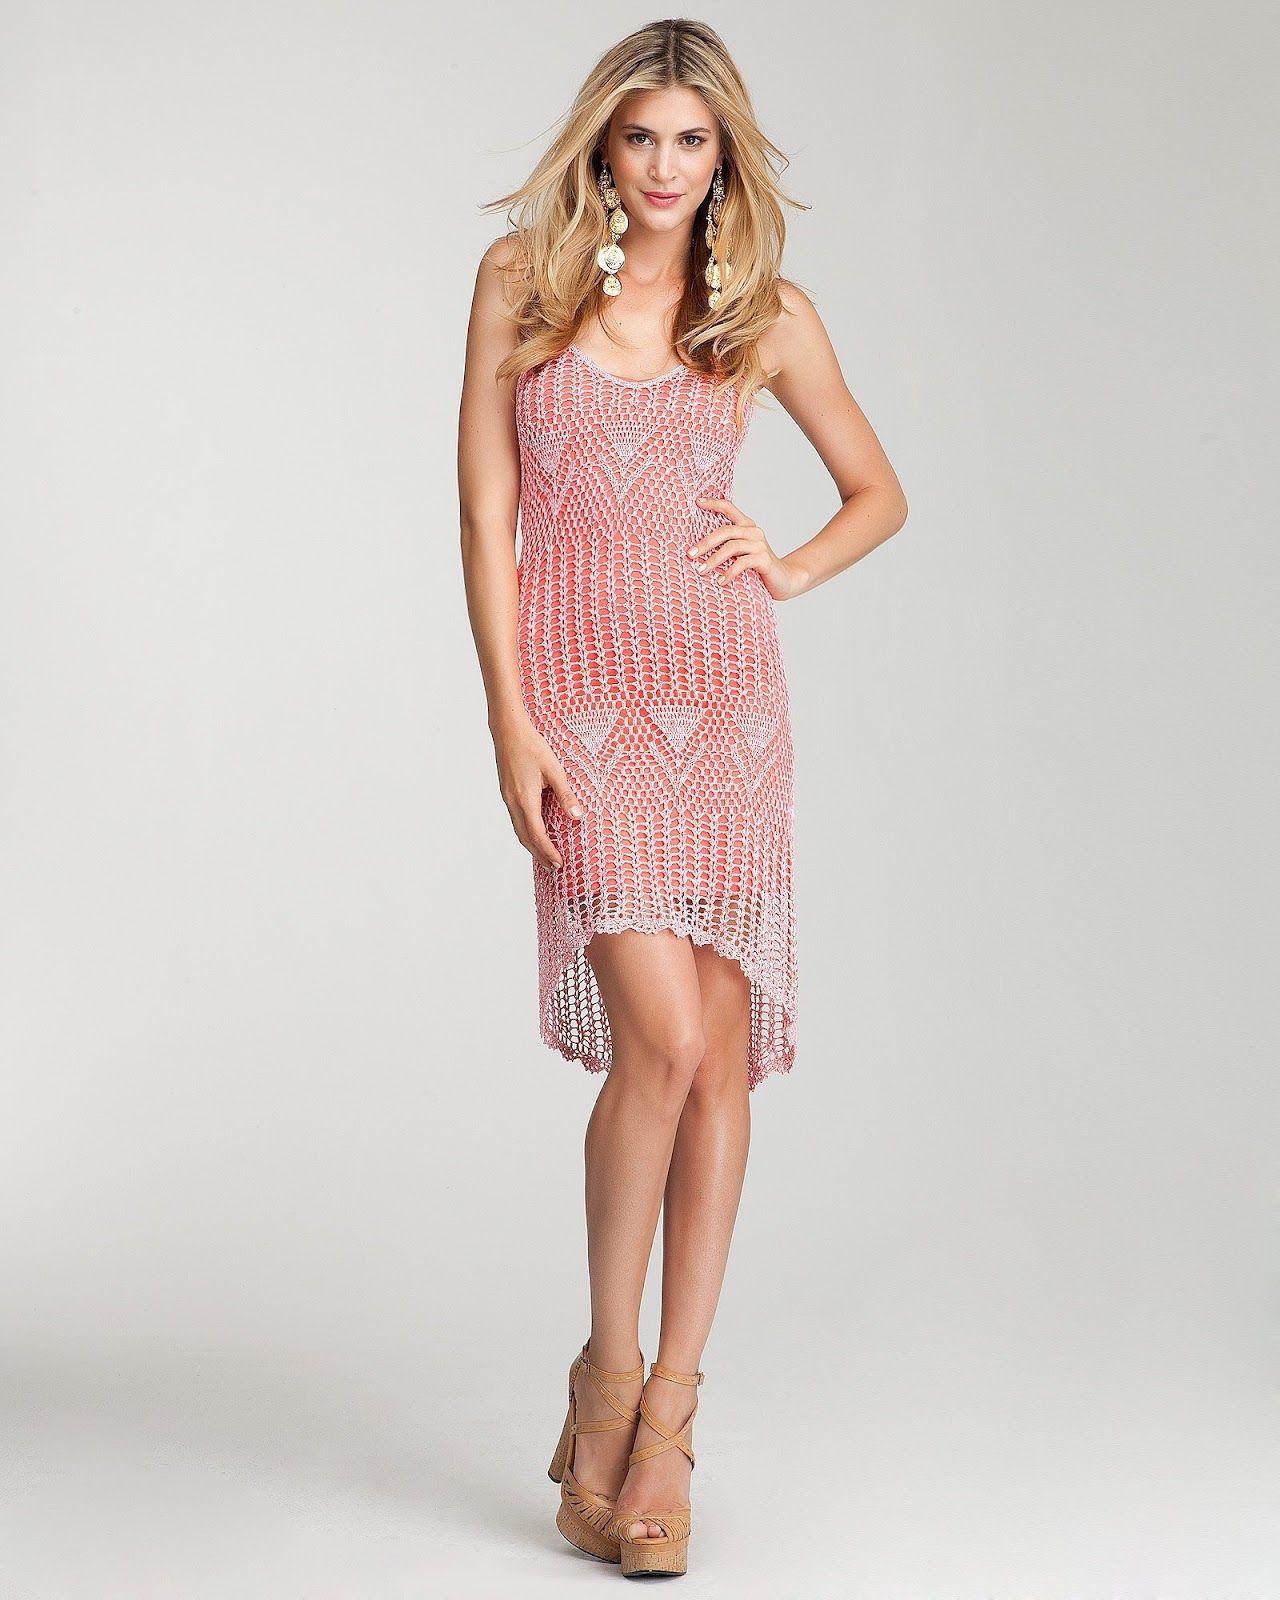 Crochetemoda: Vestido Rosa de Crochet | pareos | Pinterest | Vestido ...